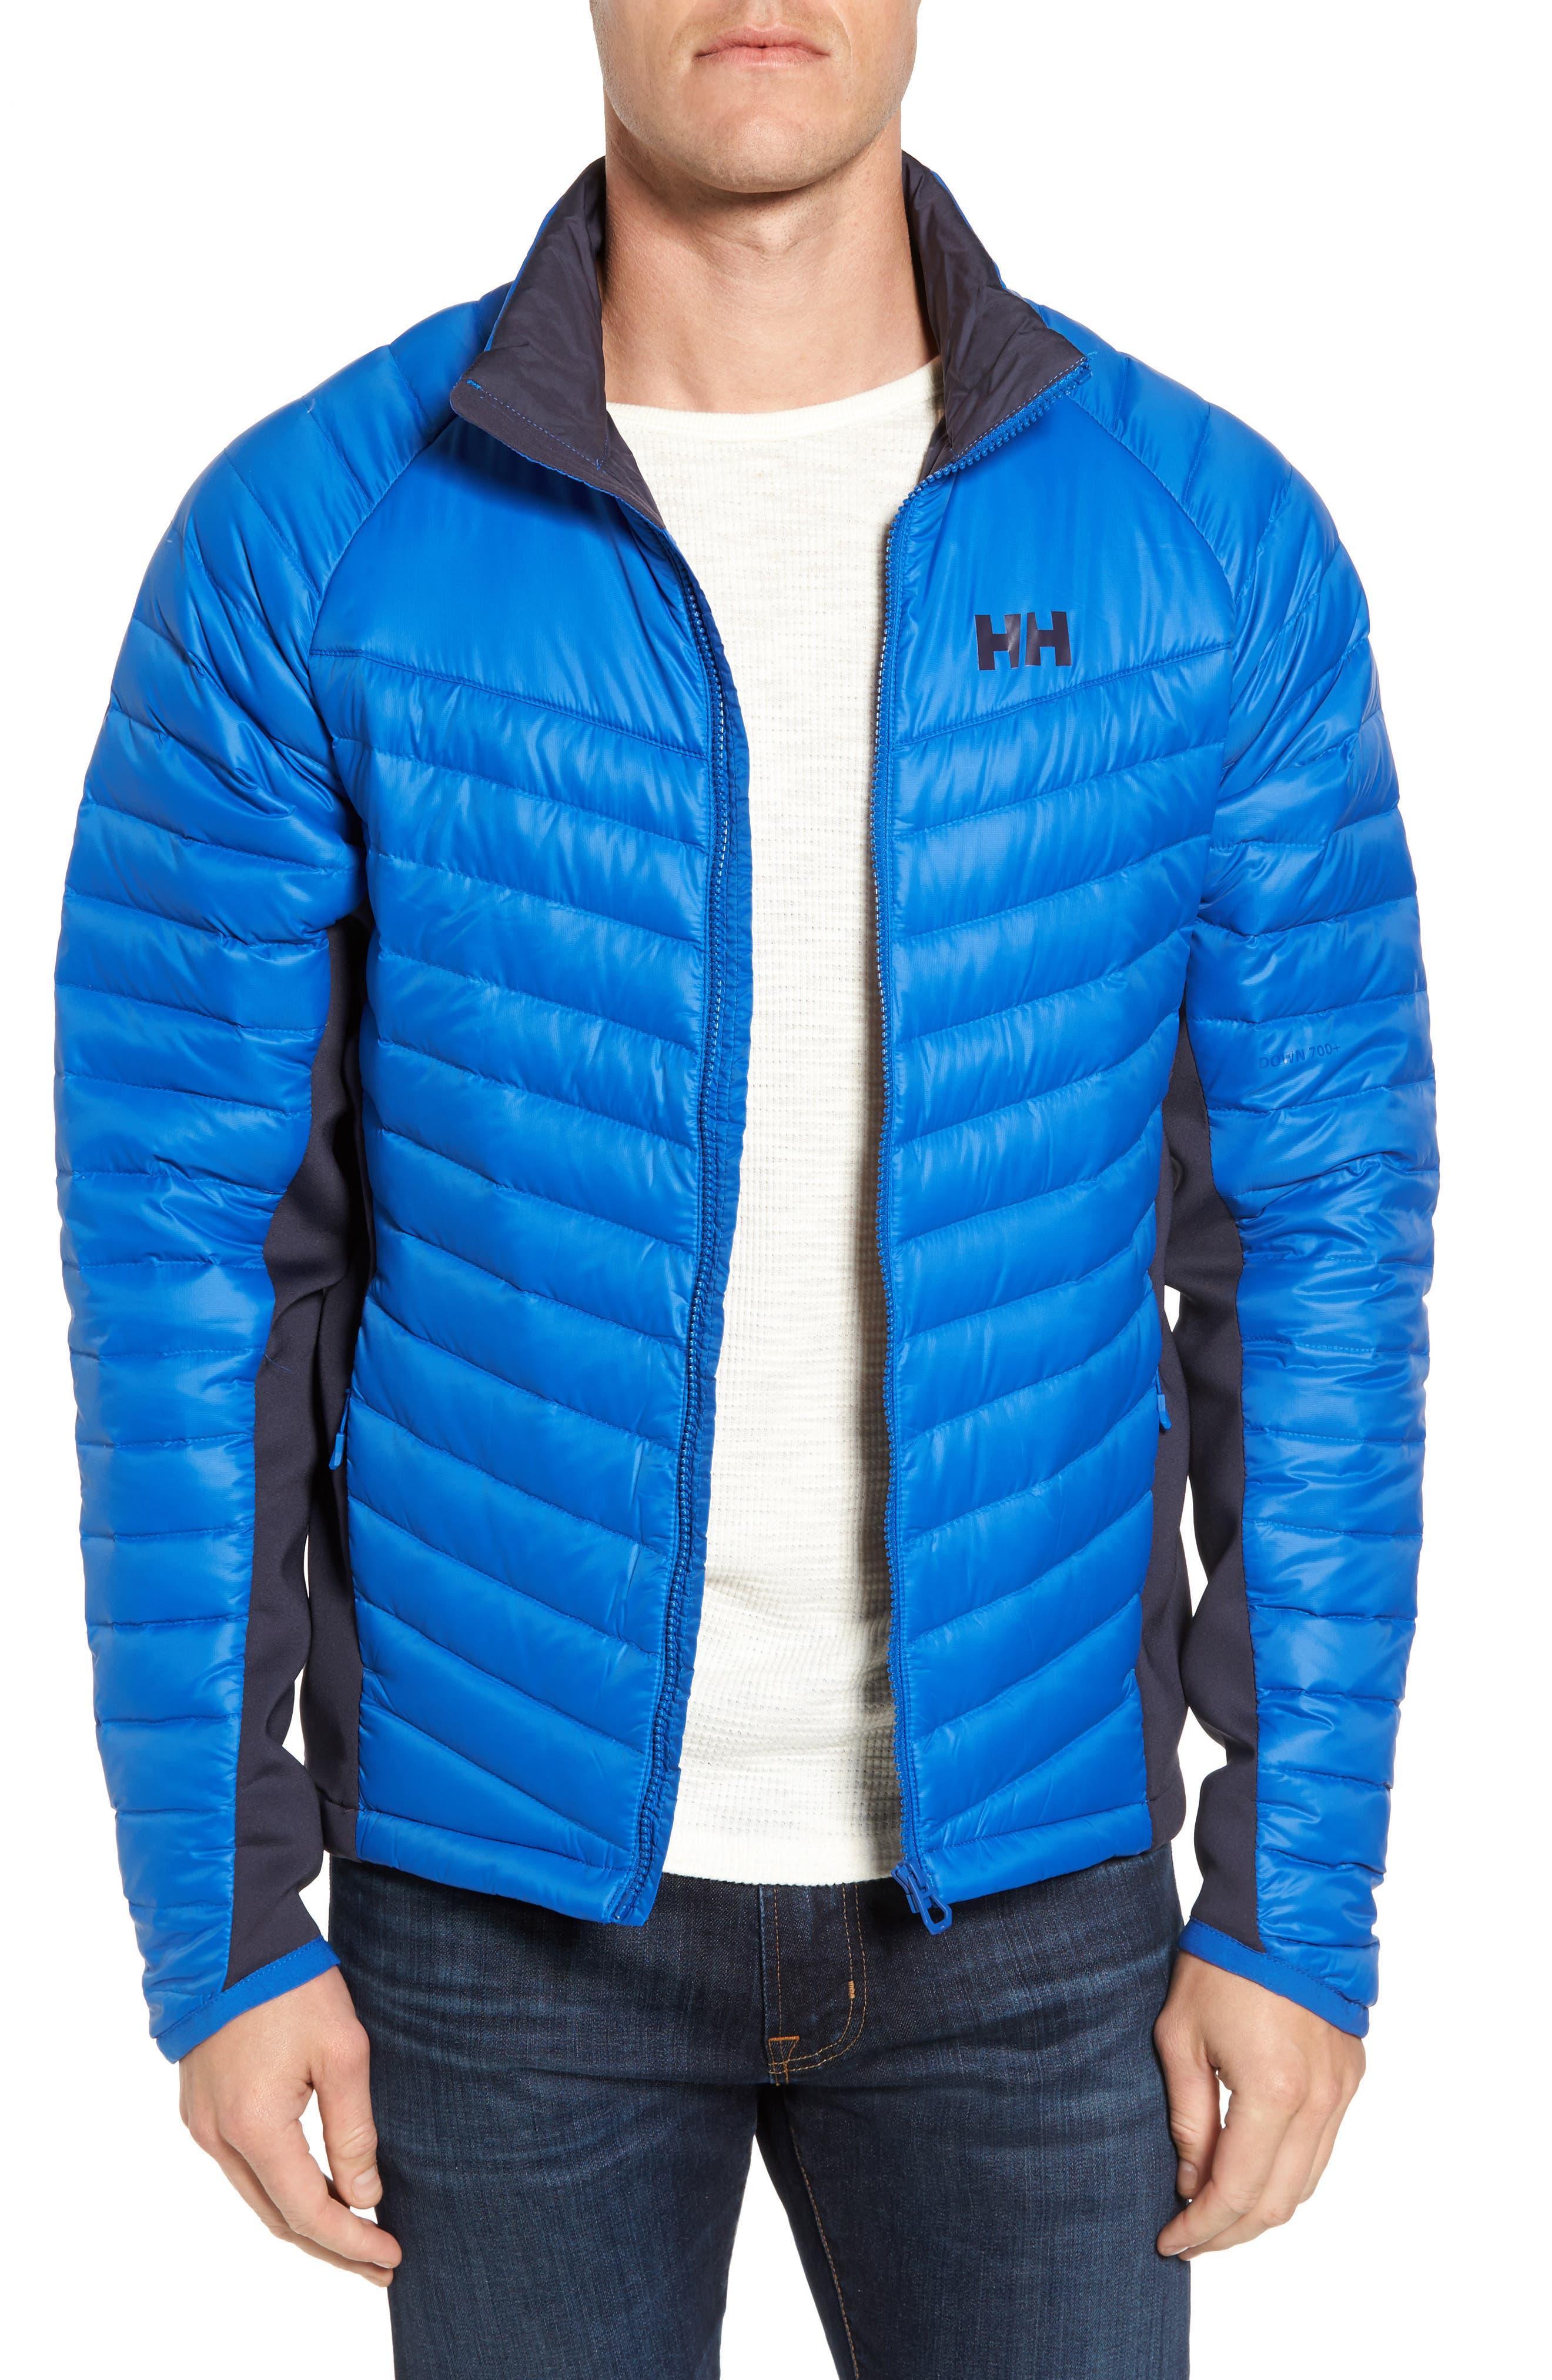 Alternate Image 1 Selected - Helly Hansen Verglas Insulator Hybrid Jacket